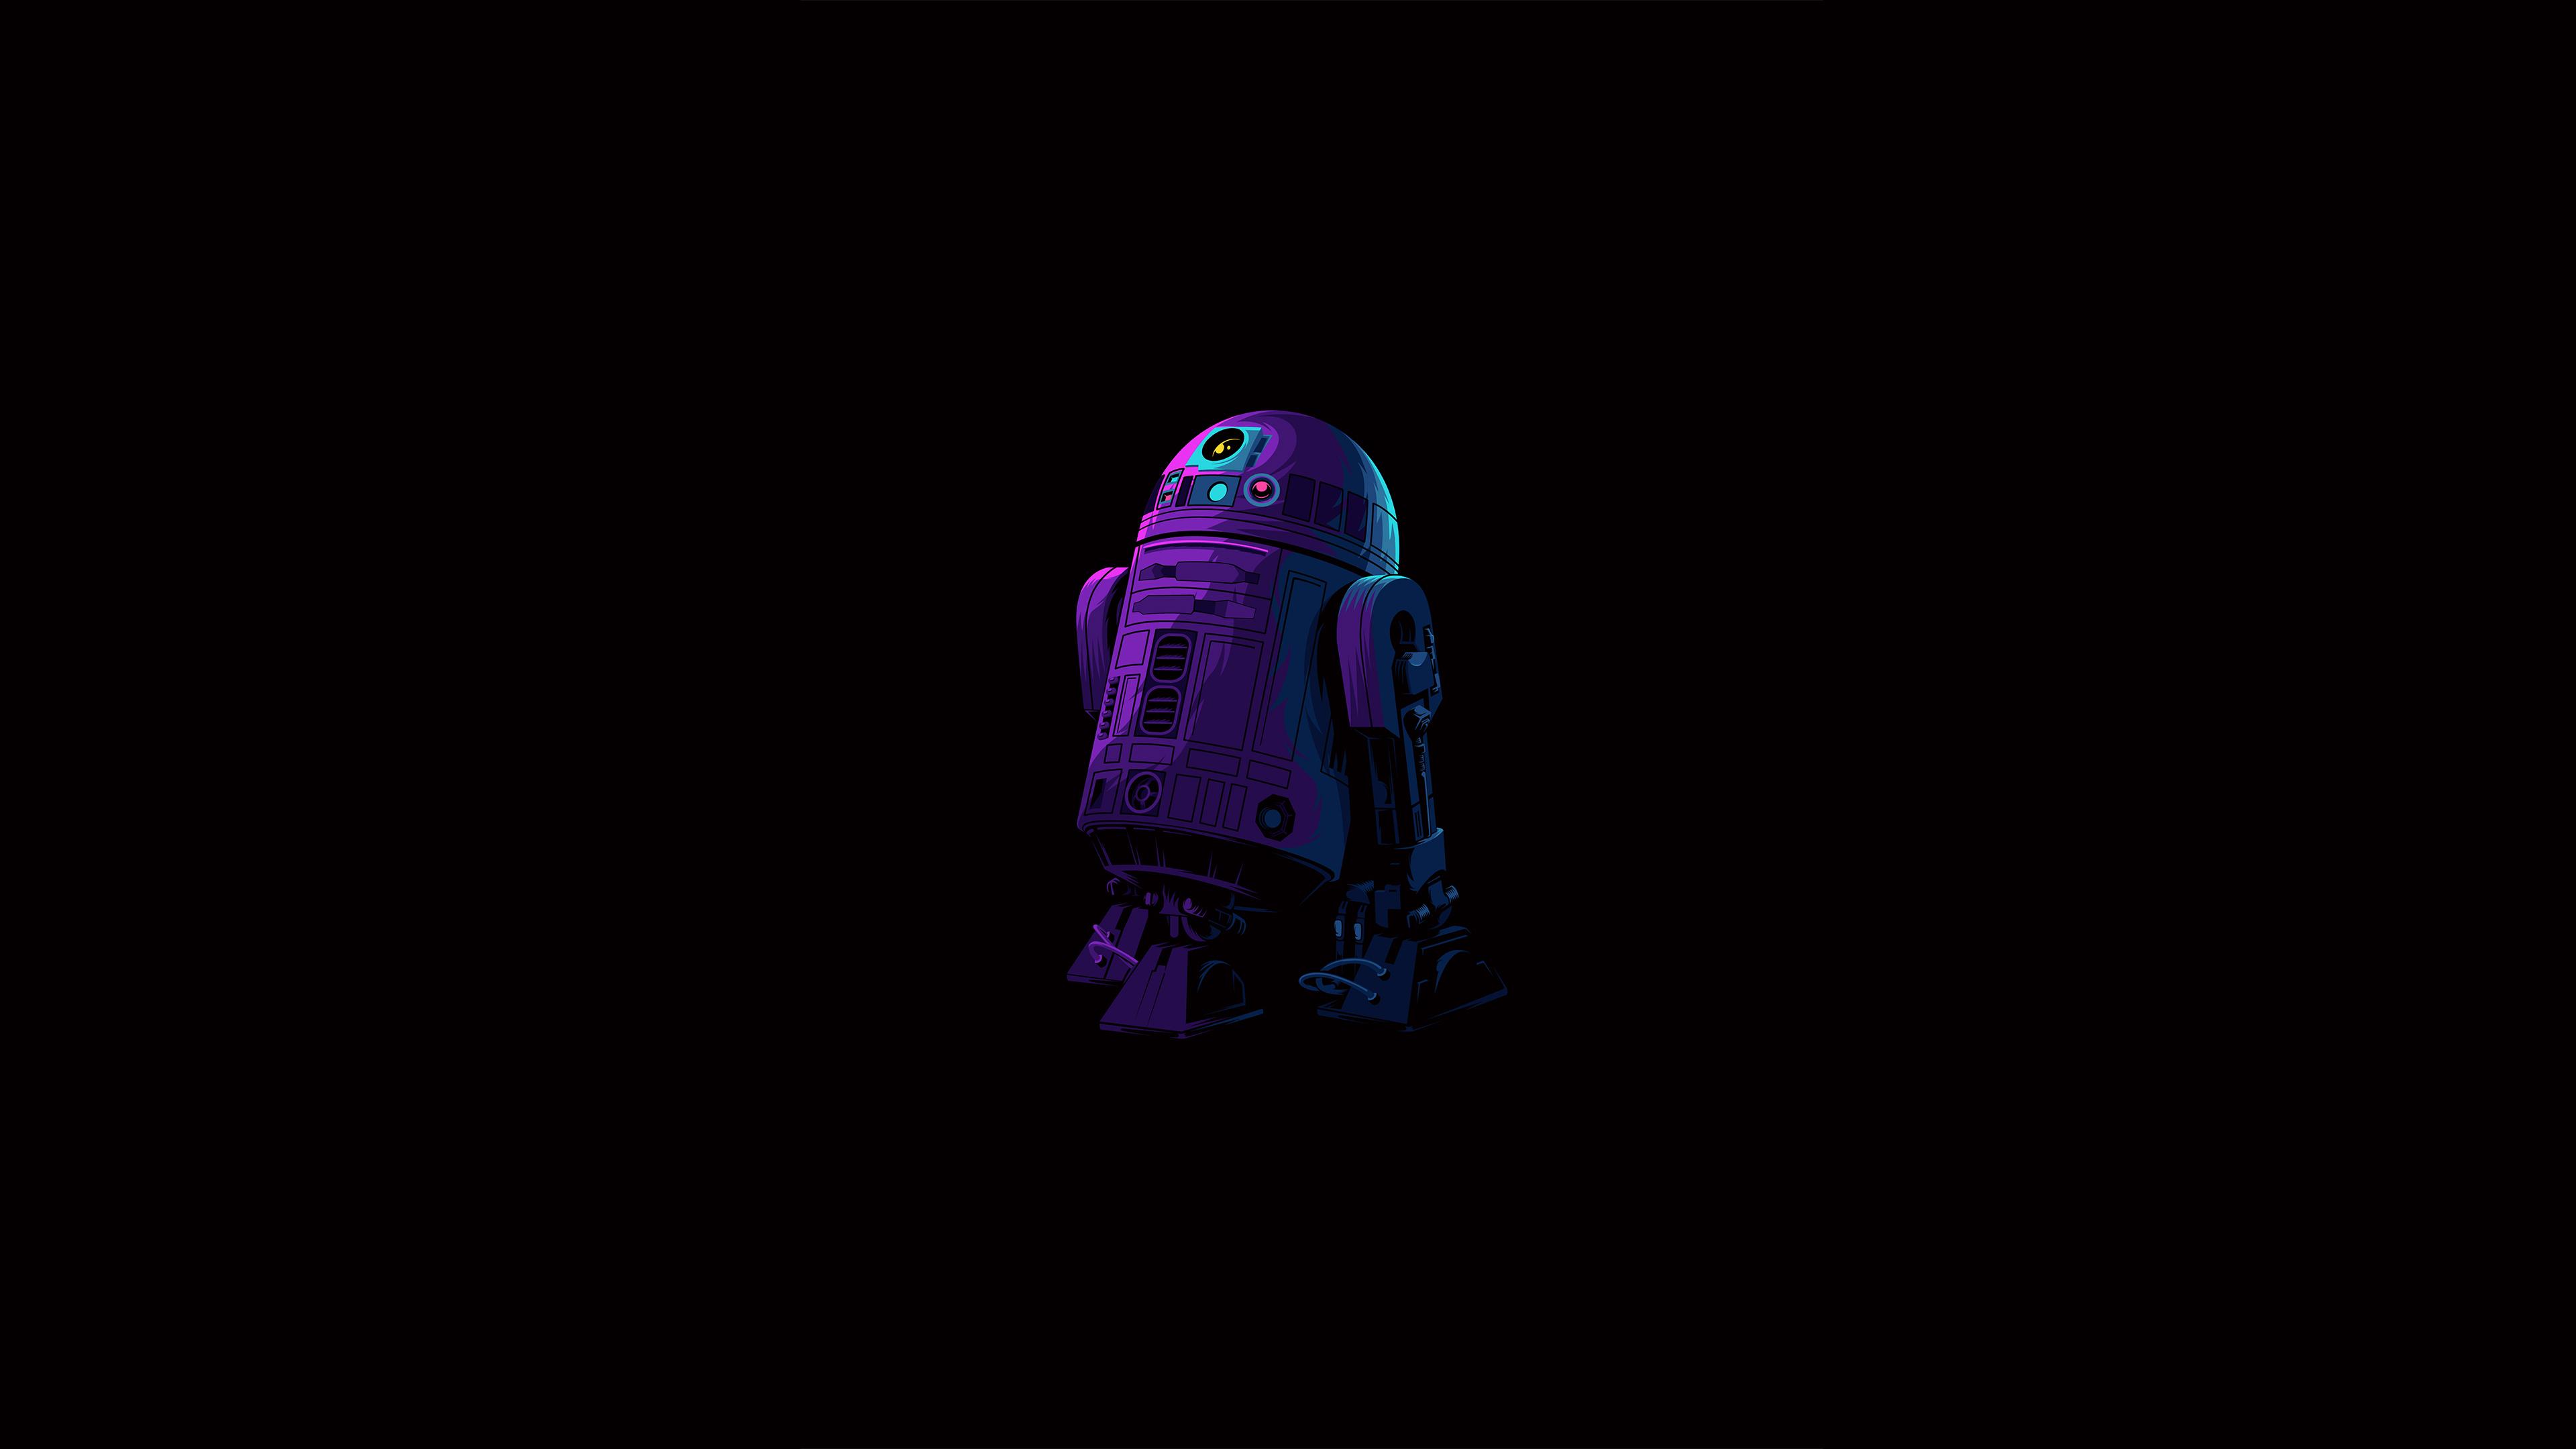 General 3840x2160 artwork illustration simple simple background minimalism black dark black background dark background colorful fictional fictional character fictional characters character design  R2-D2 robot